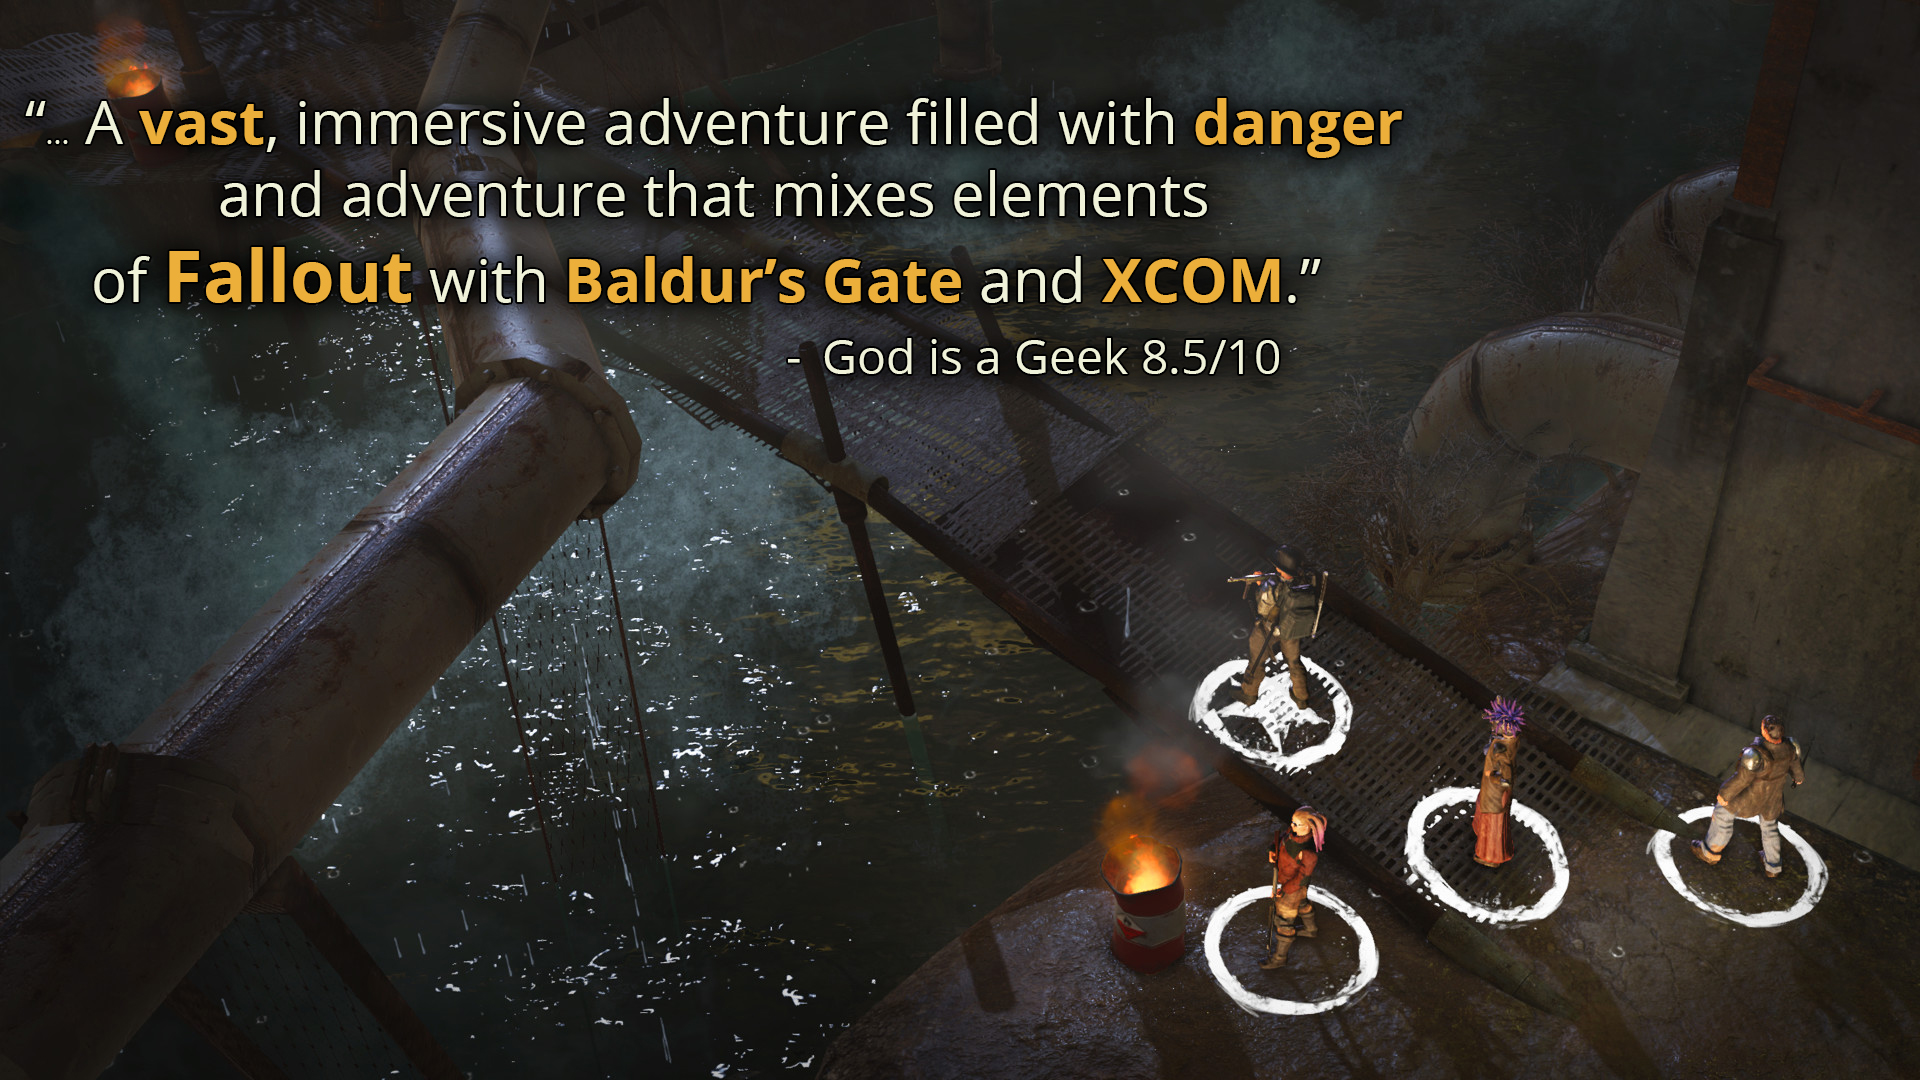 Wasteland 2 Director's Cut - Digital Classic Edition screenshot 2